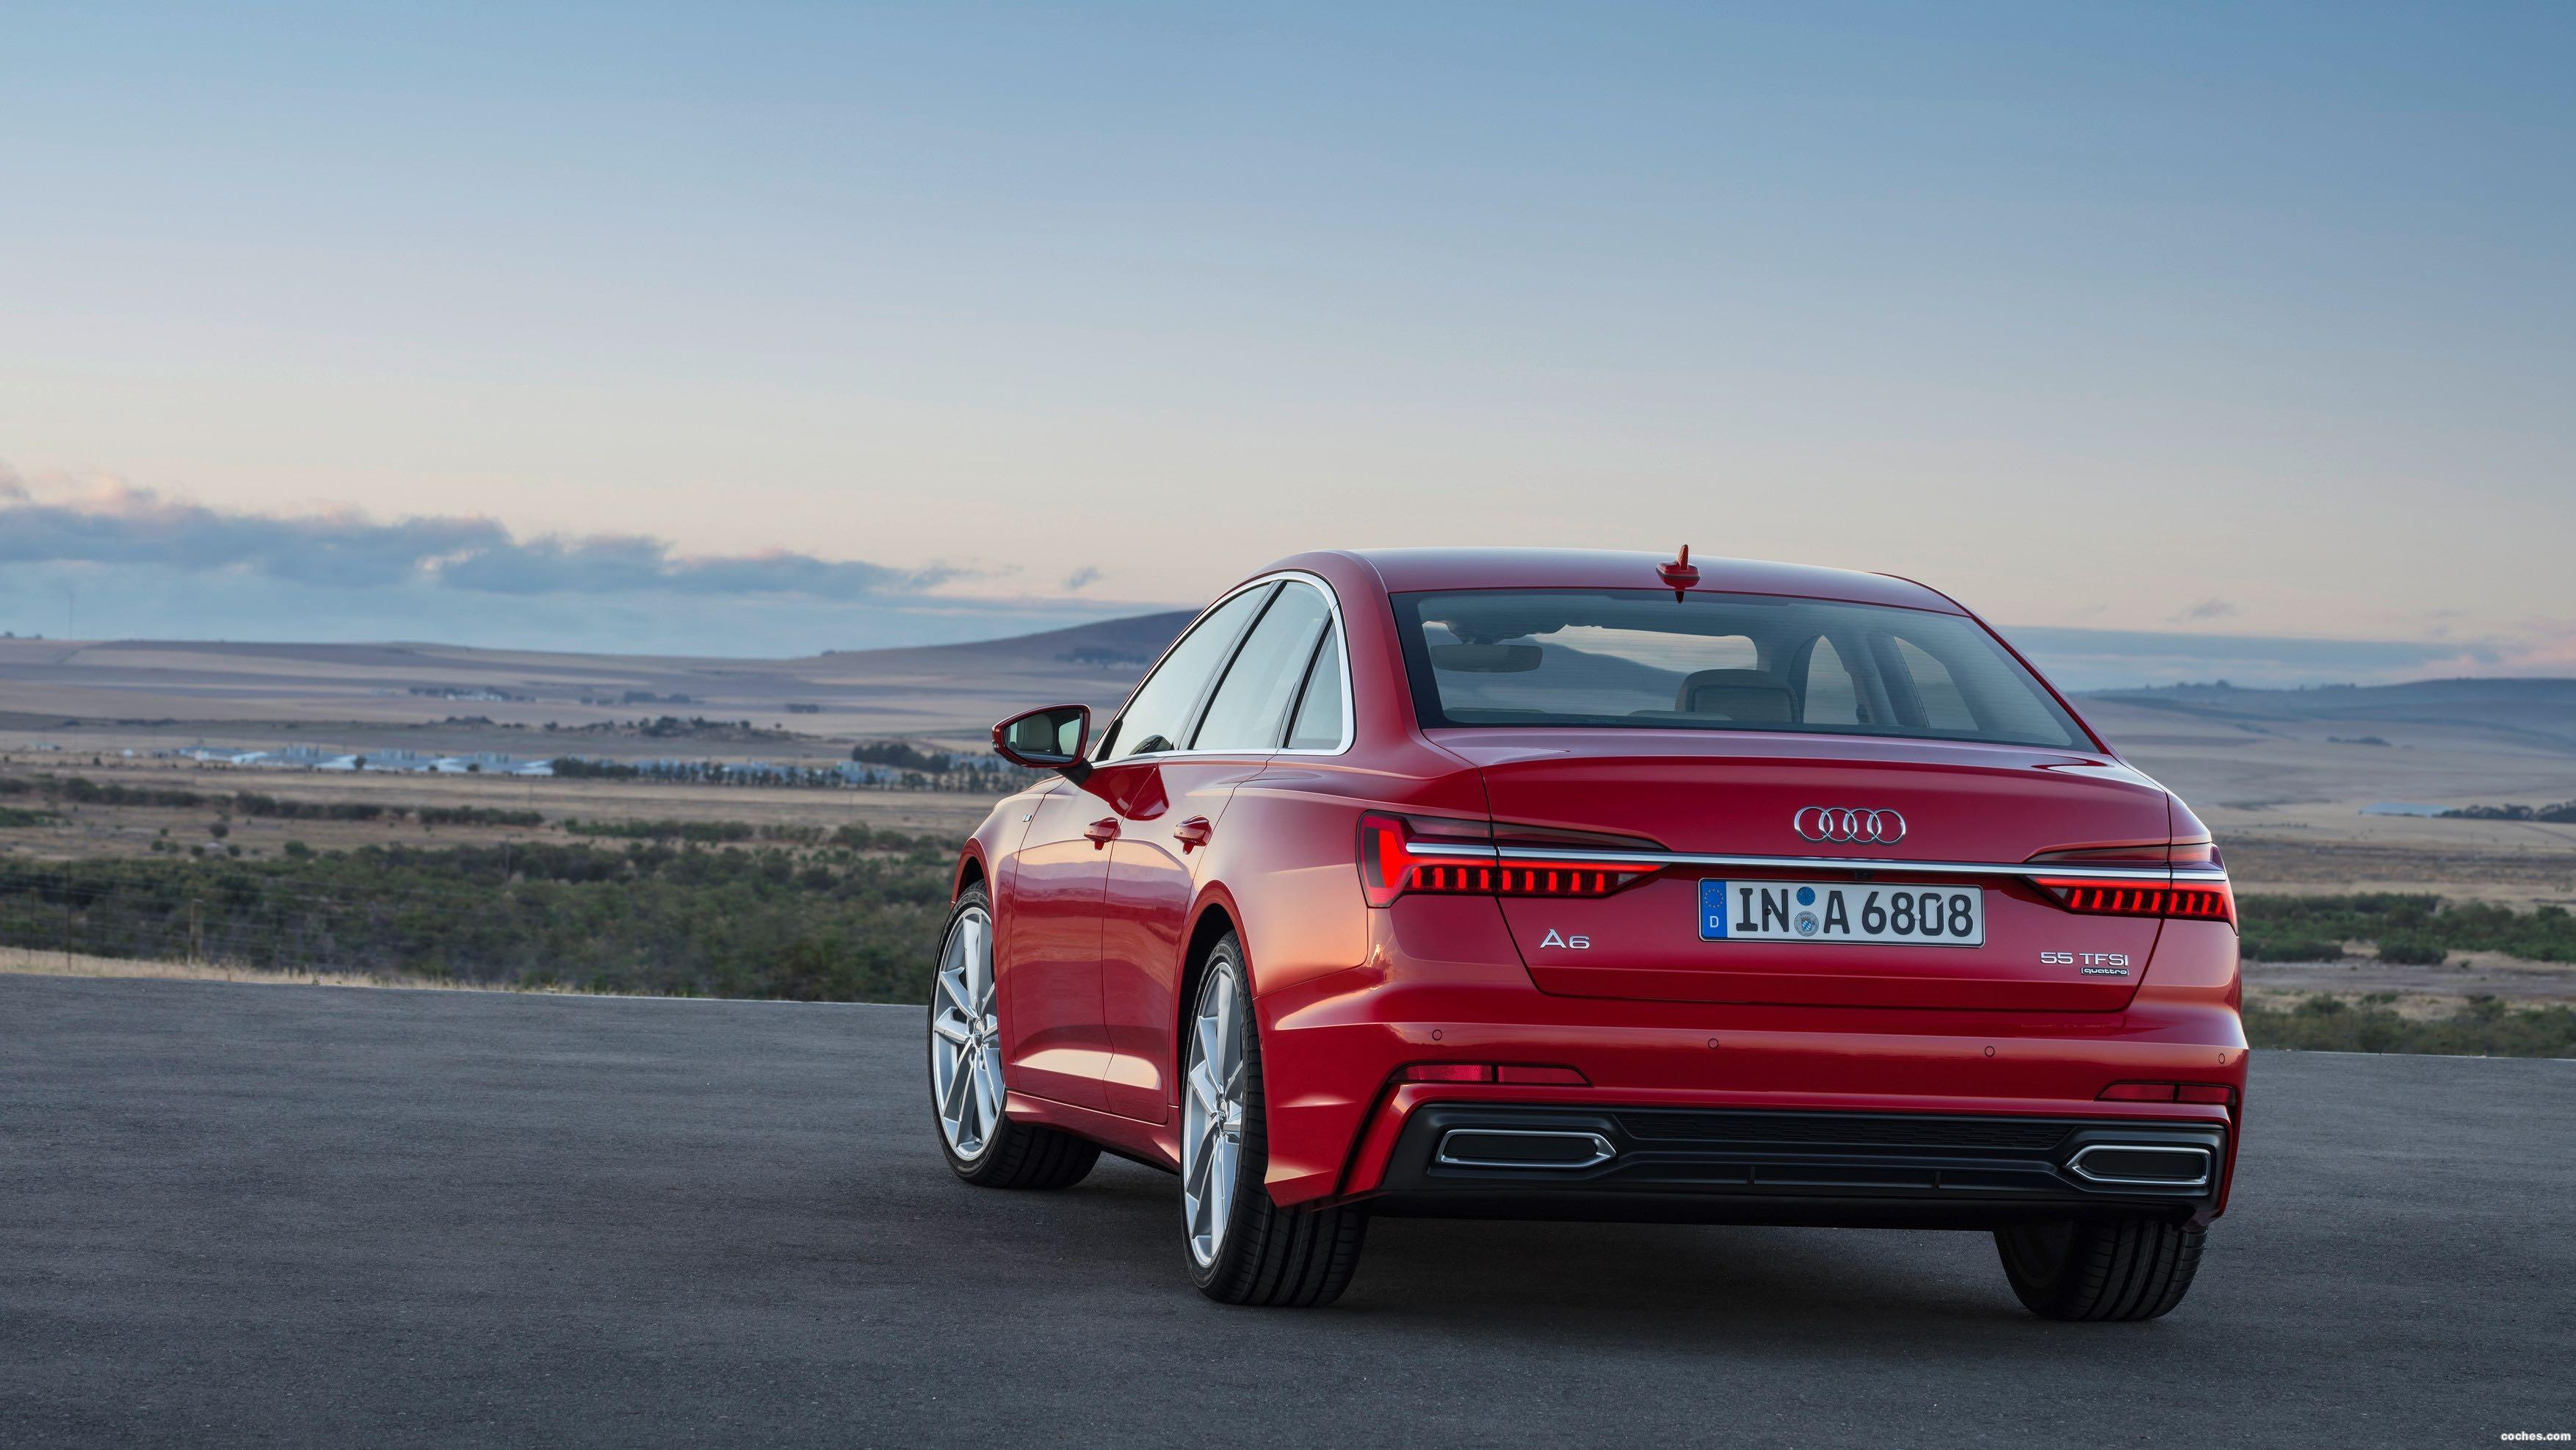 Foto 2 de Audi A6 55 TFSI quattro S line 2018